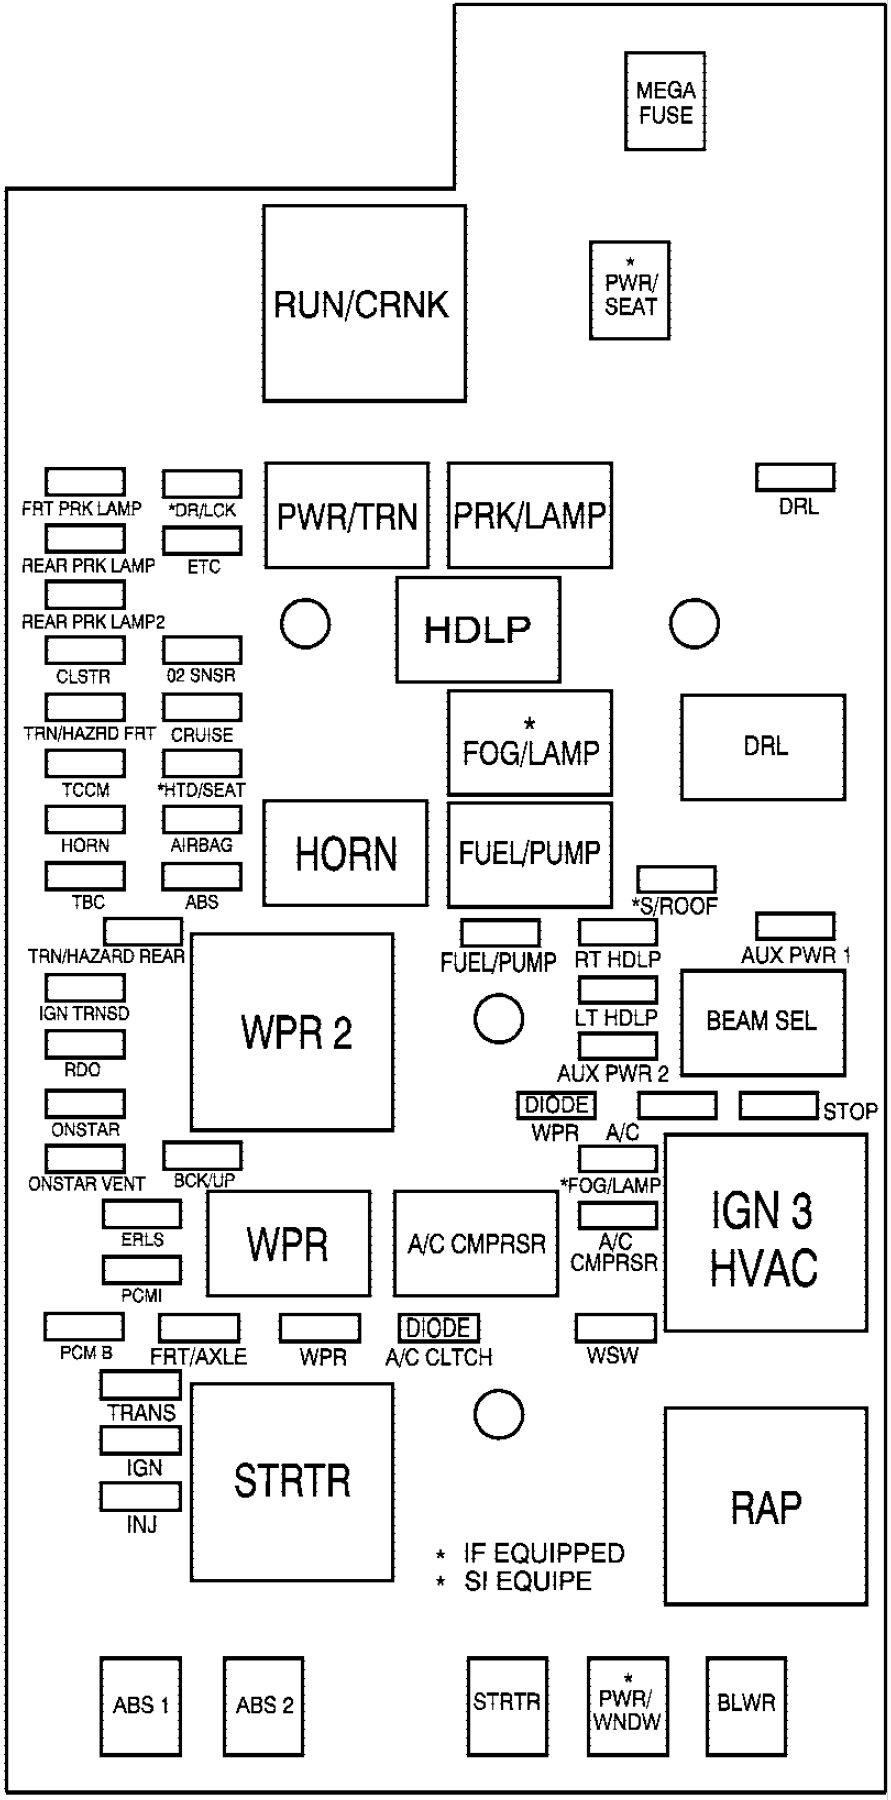 2011 gmc canyon engine diagram 28asyaunitedde